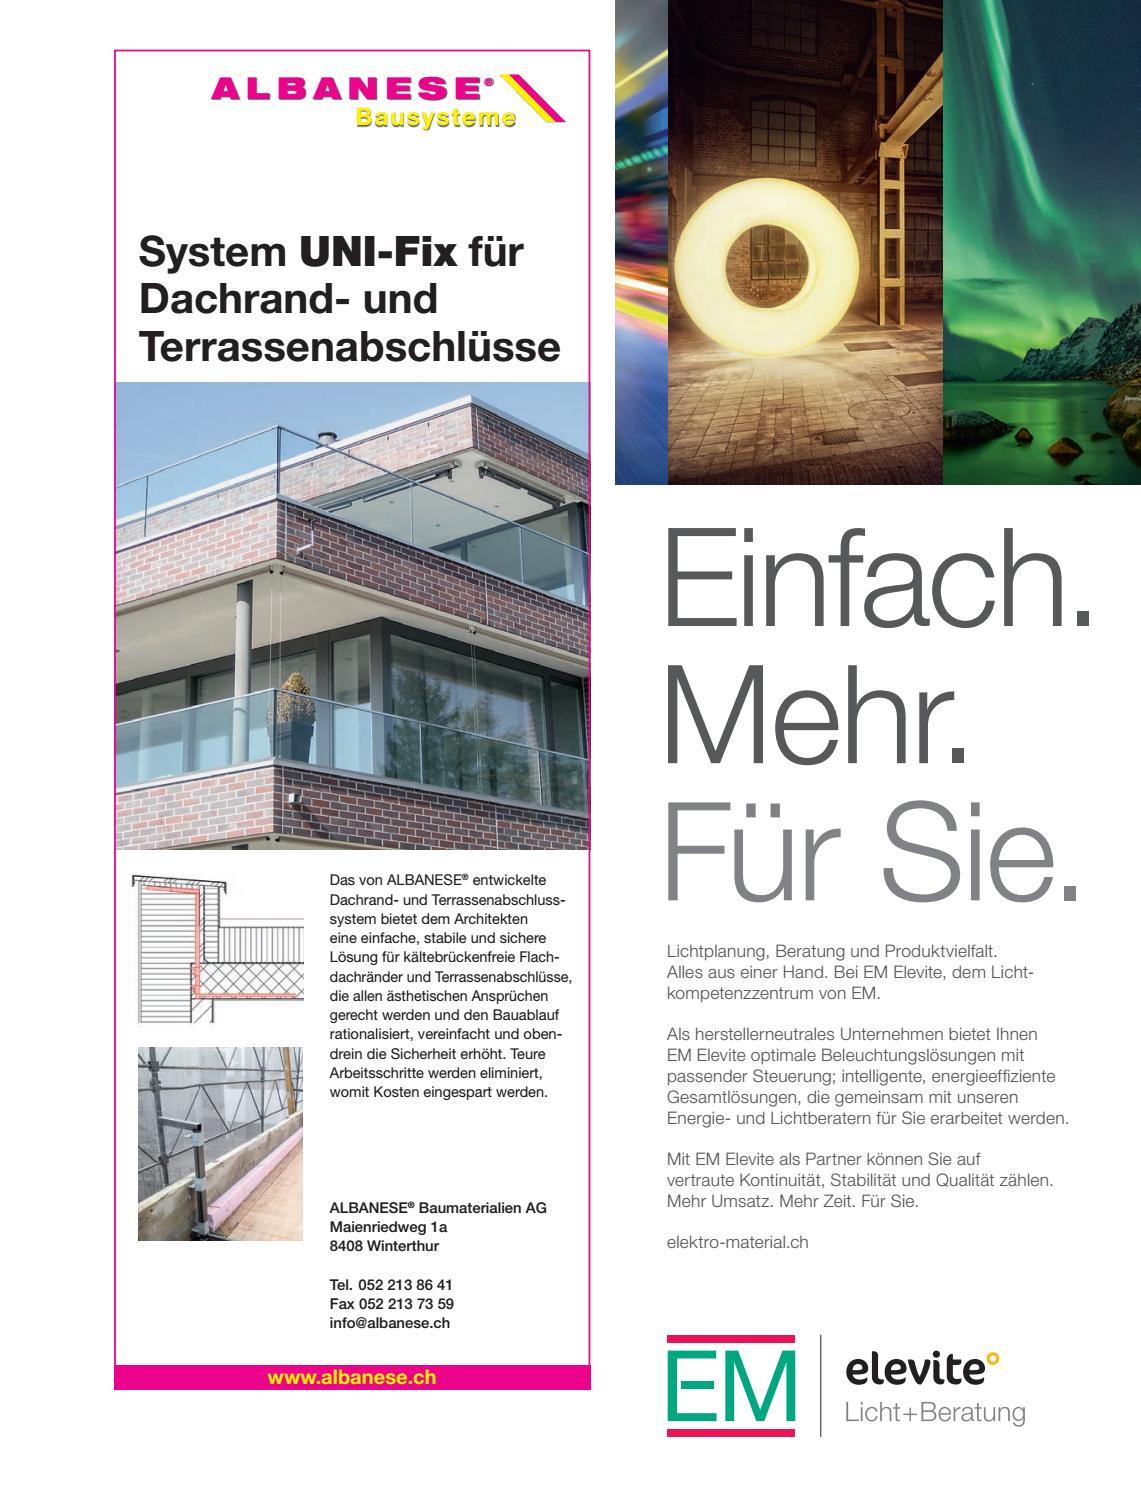 architektur+technik 10 2016 by bl verlag ag - issuu